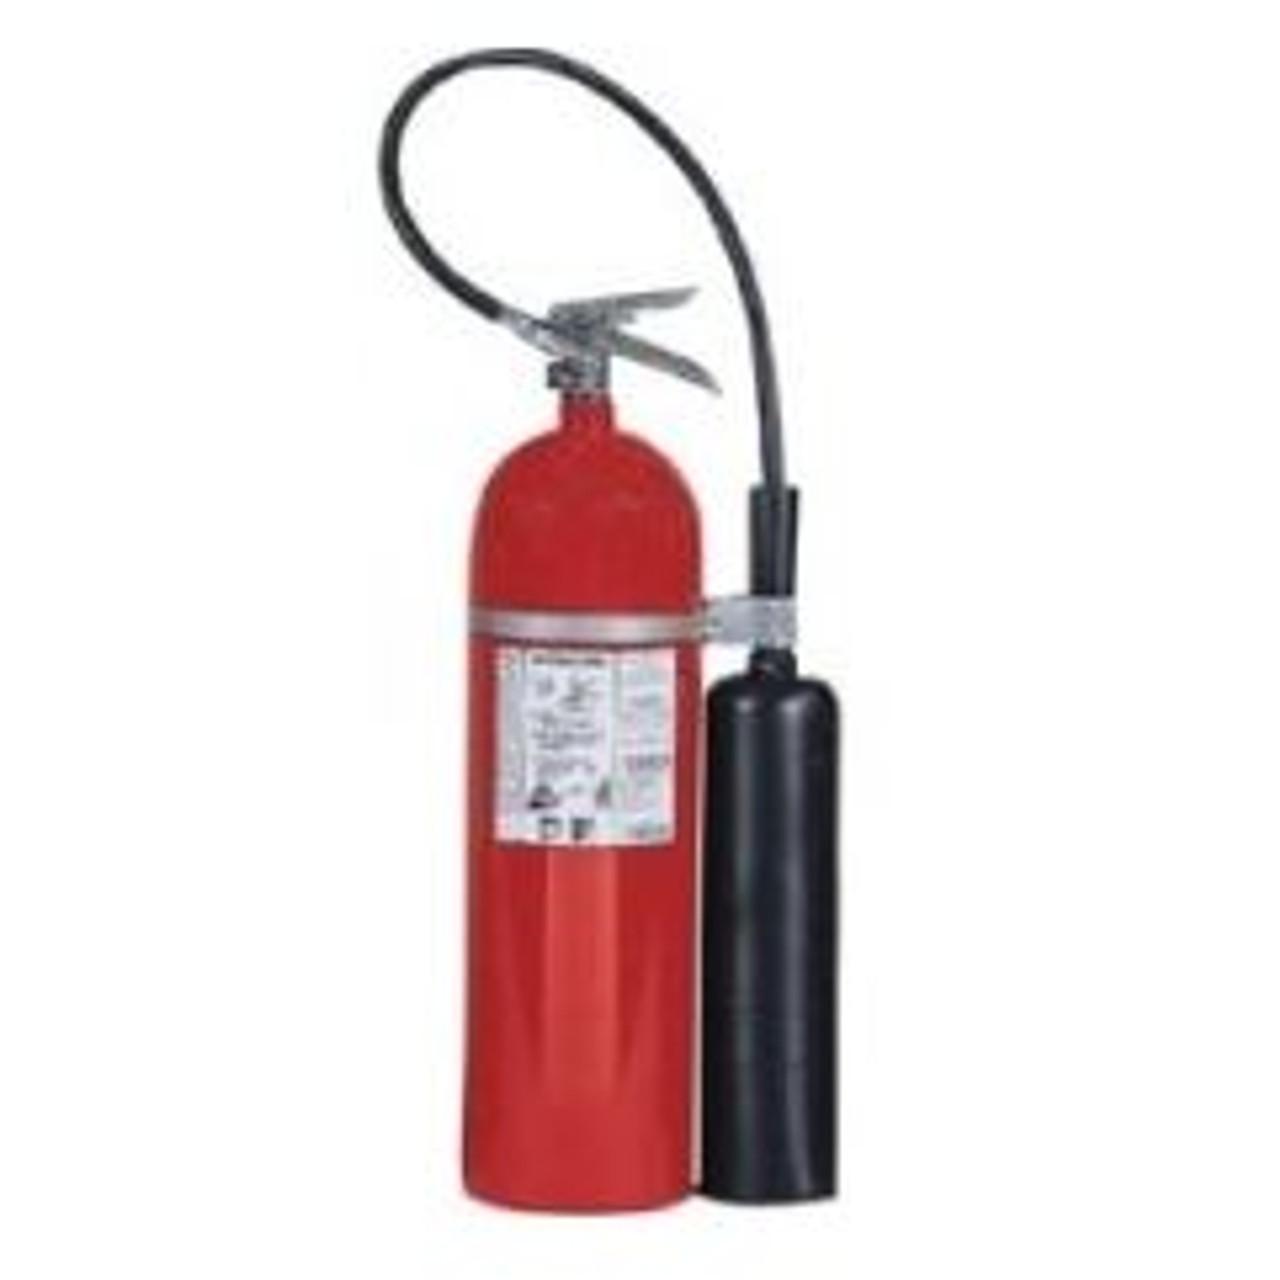 Amerex 331 - 15 lb Carbon Dioxide Fire Extinguisher